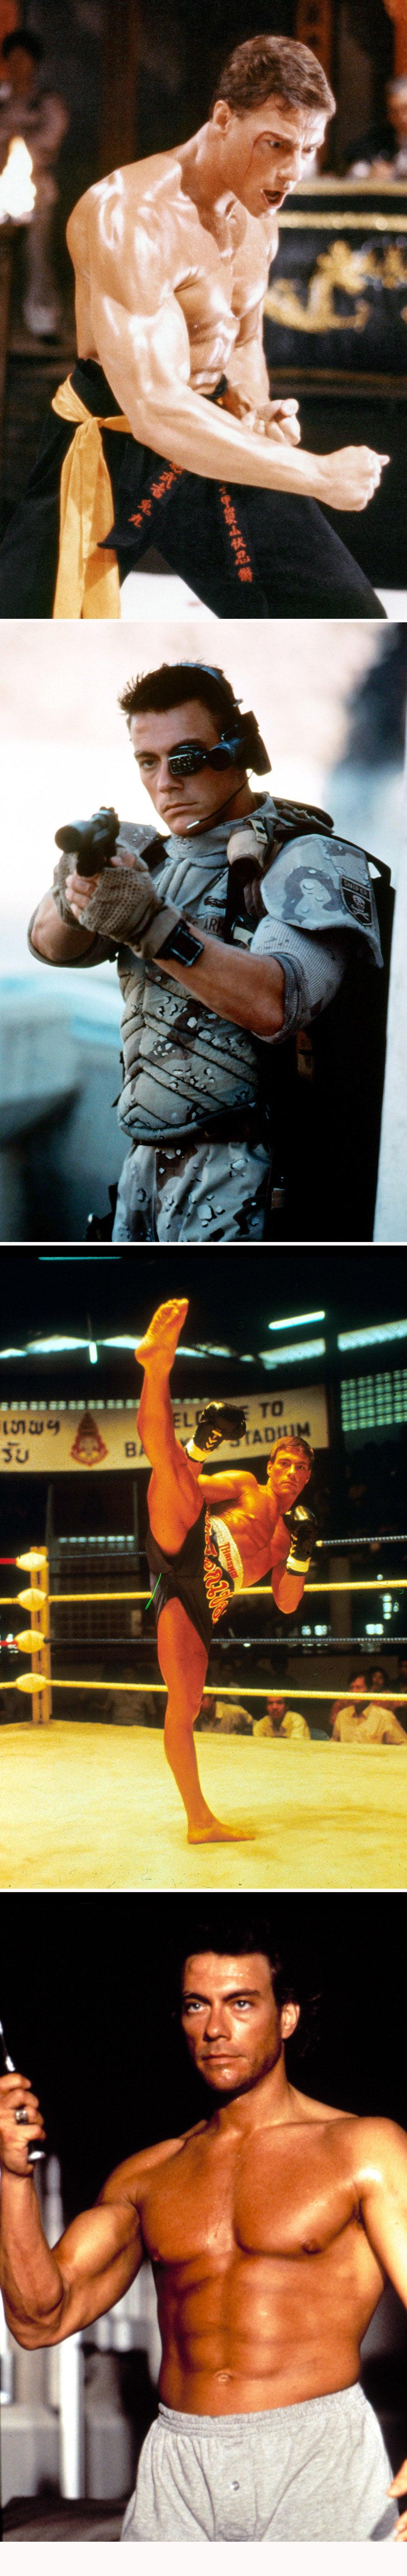 Van Damme in Bloodsport (1998), Universal Soldier (1992), Kickboxer (1989), and Timecop (1994).